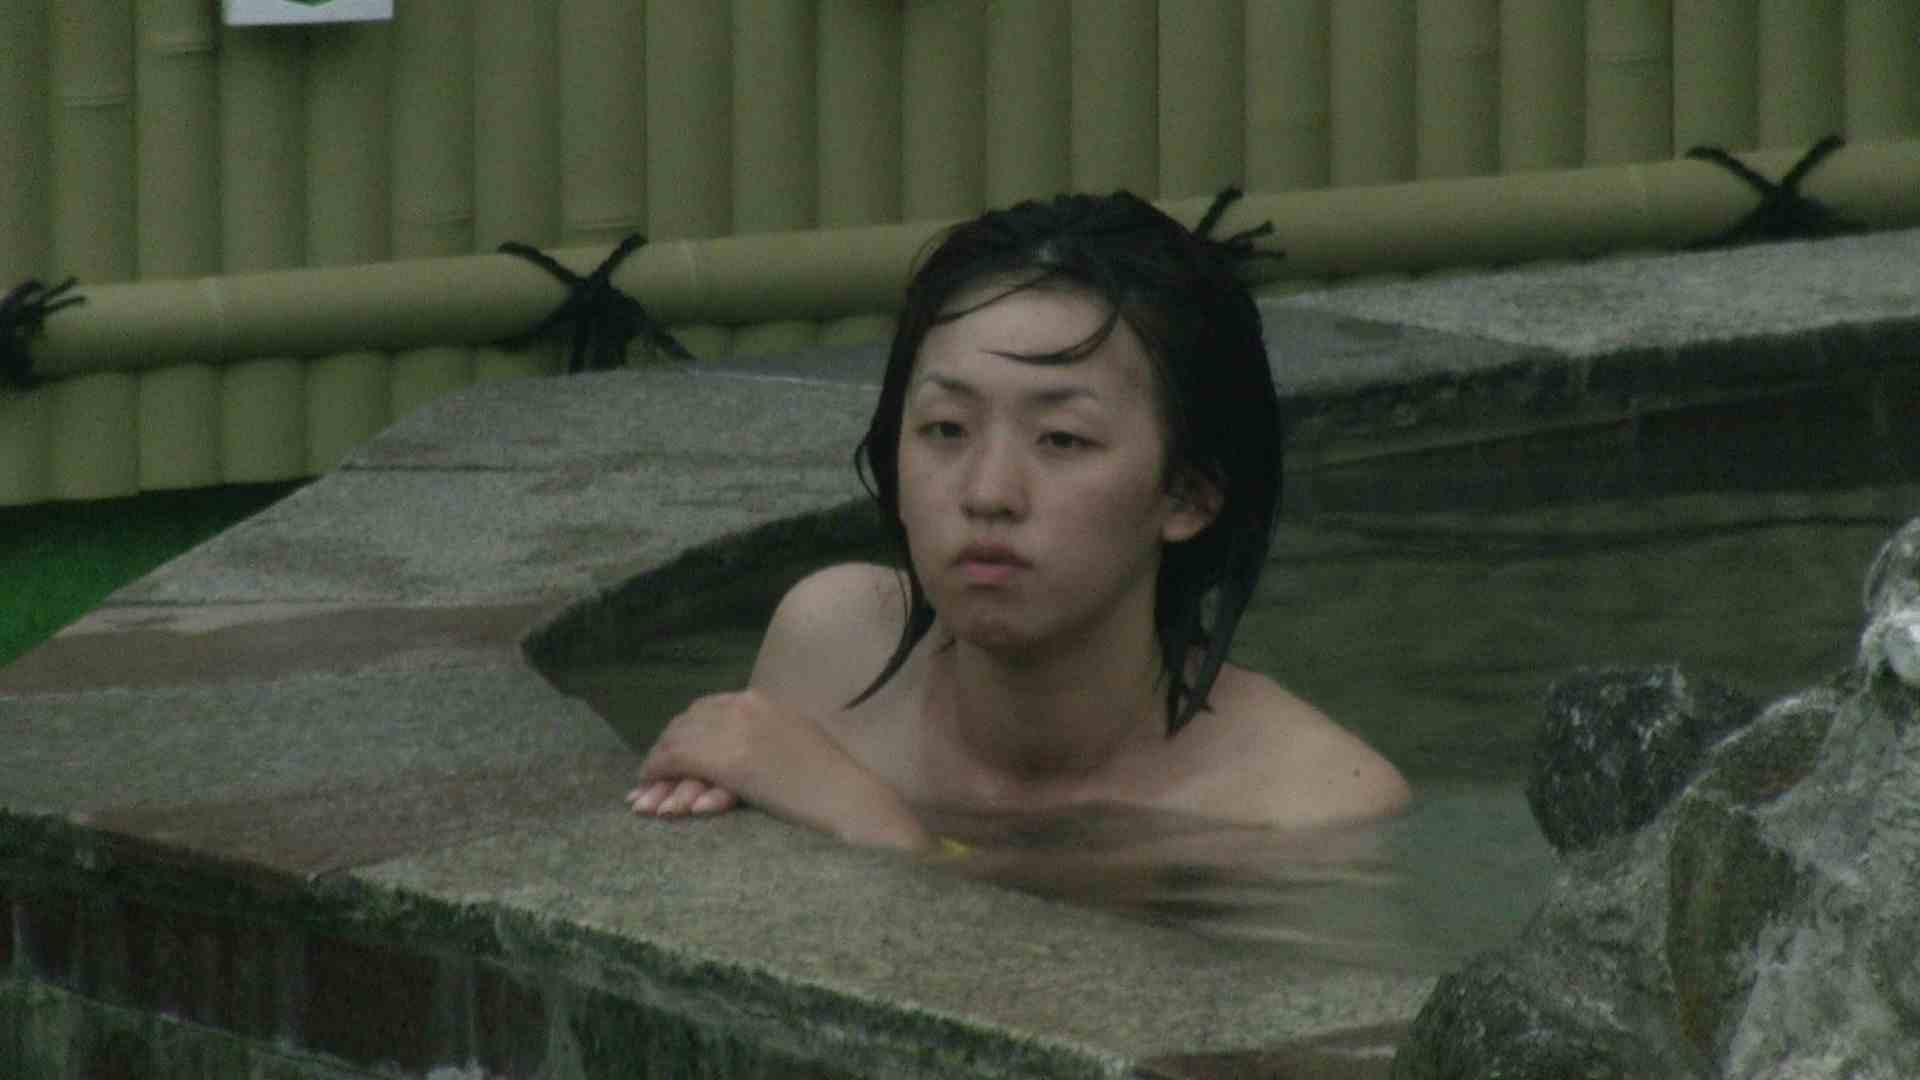 Aquaな露天風呂Vol.170 0  65連発 36